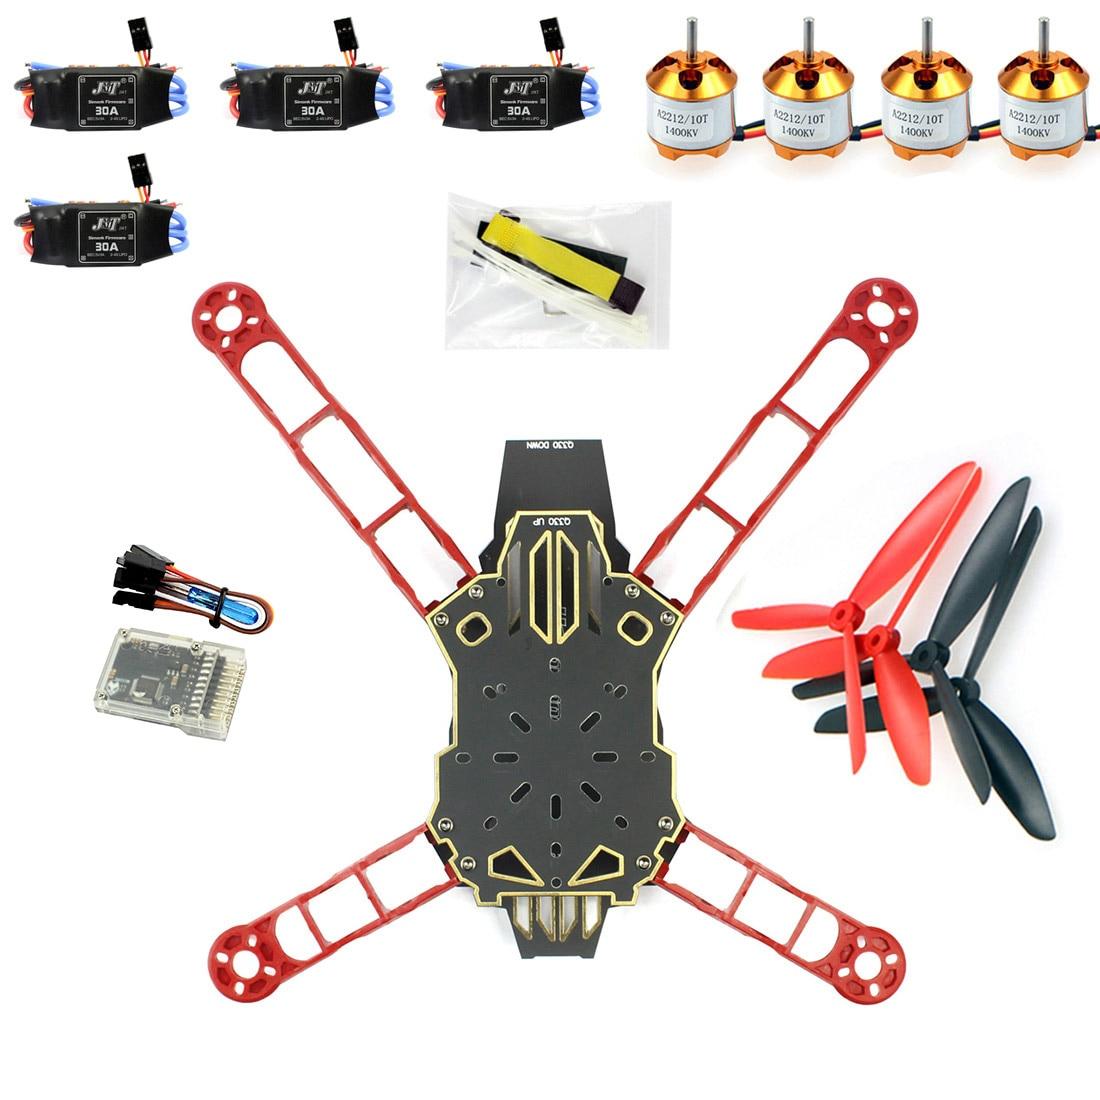 Q330 Across Frame QQ Super Controller 1400KV Motor 30A ESC Propeller Kit for DIY RC Drone Quadrocopter Aircraft F11797 H